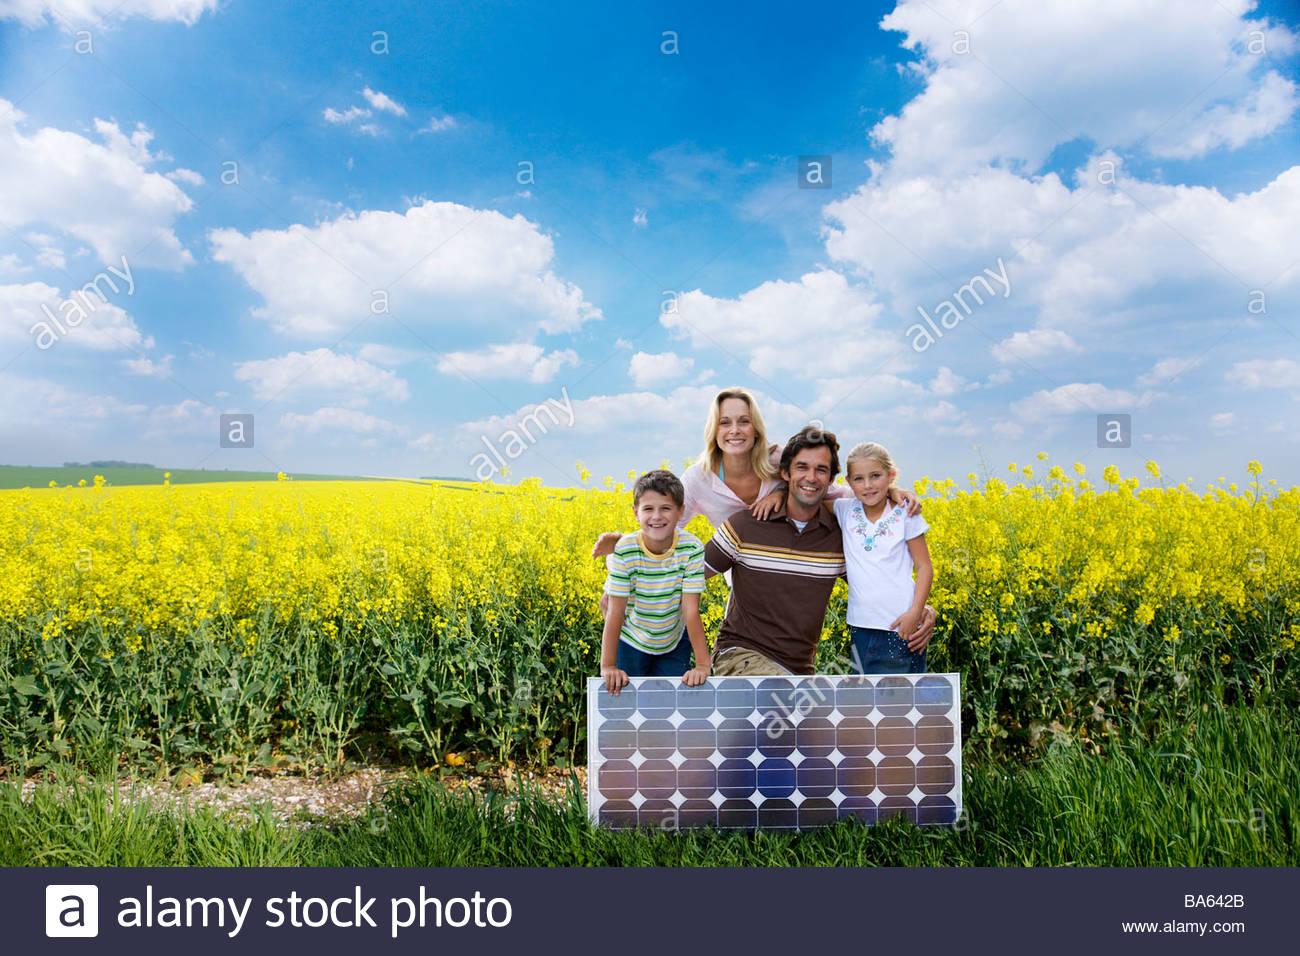 Familia posando con panel solar Imagen De Stock